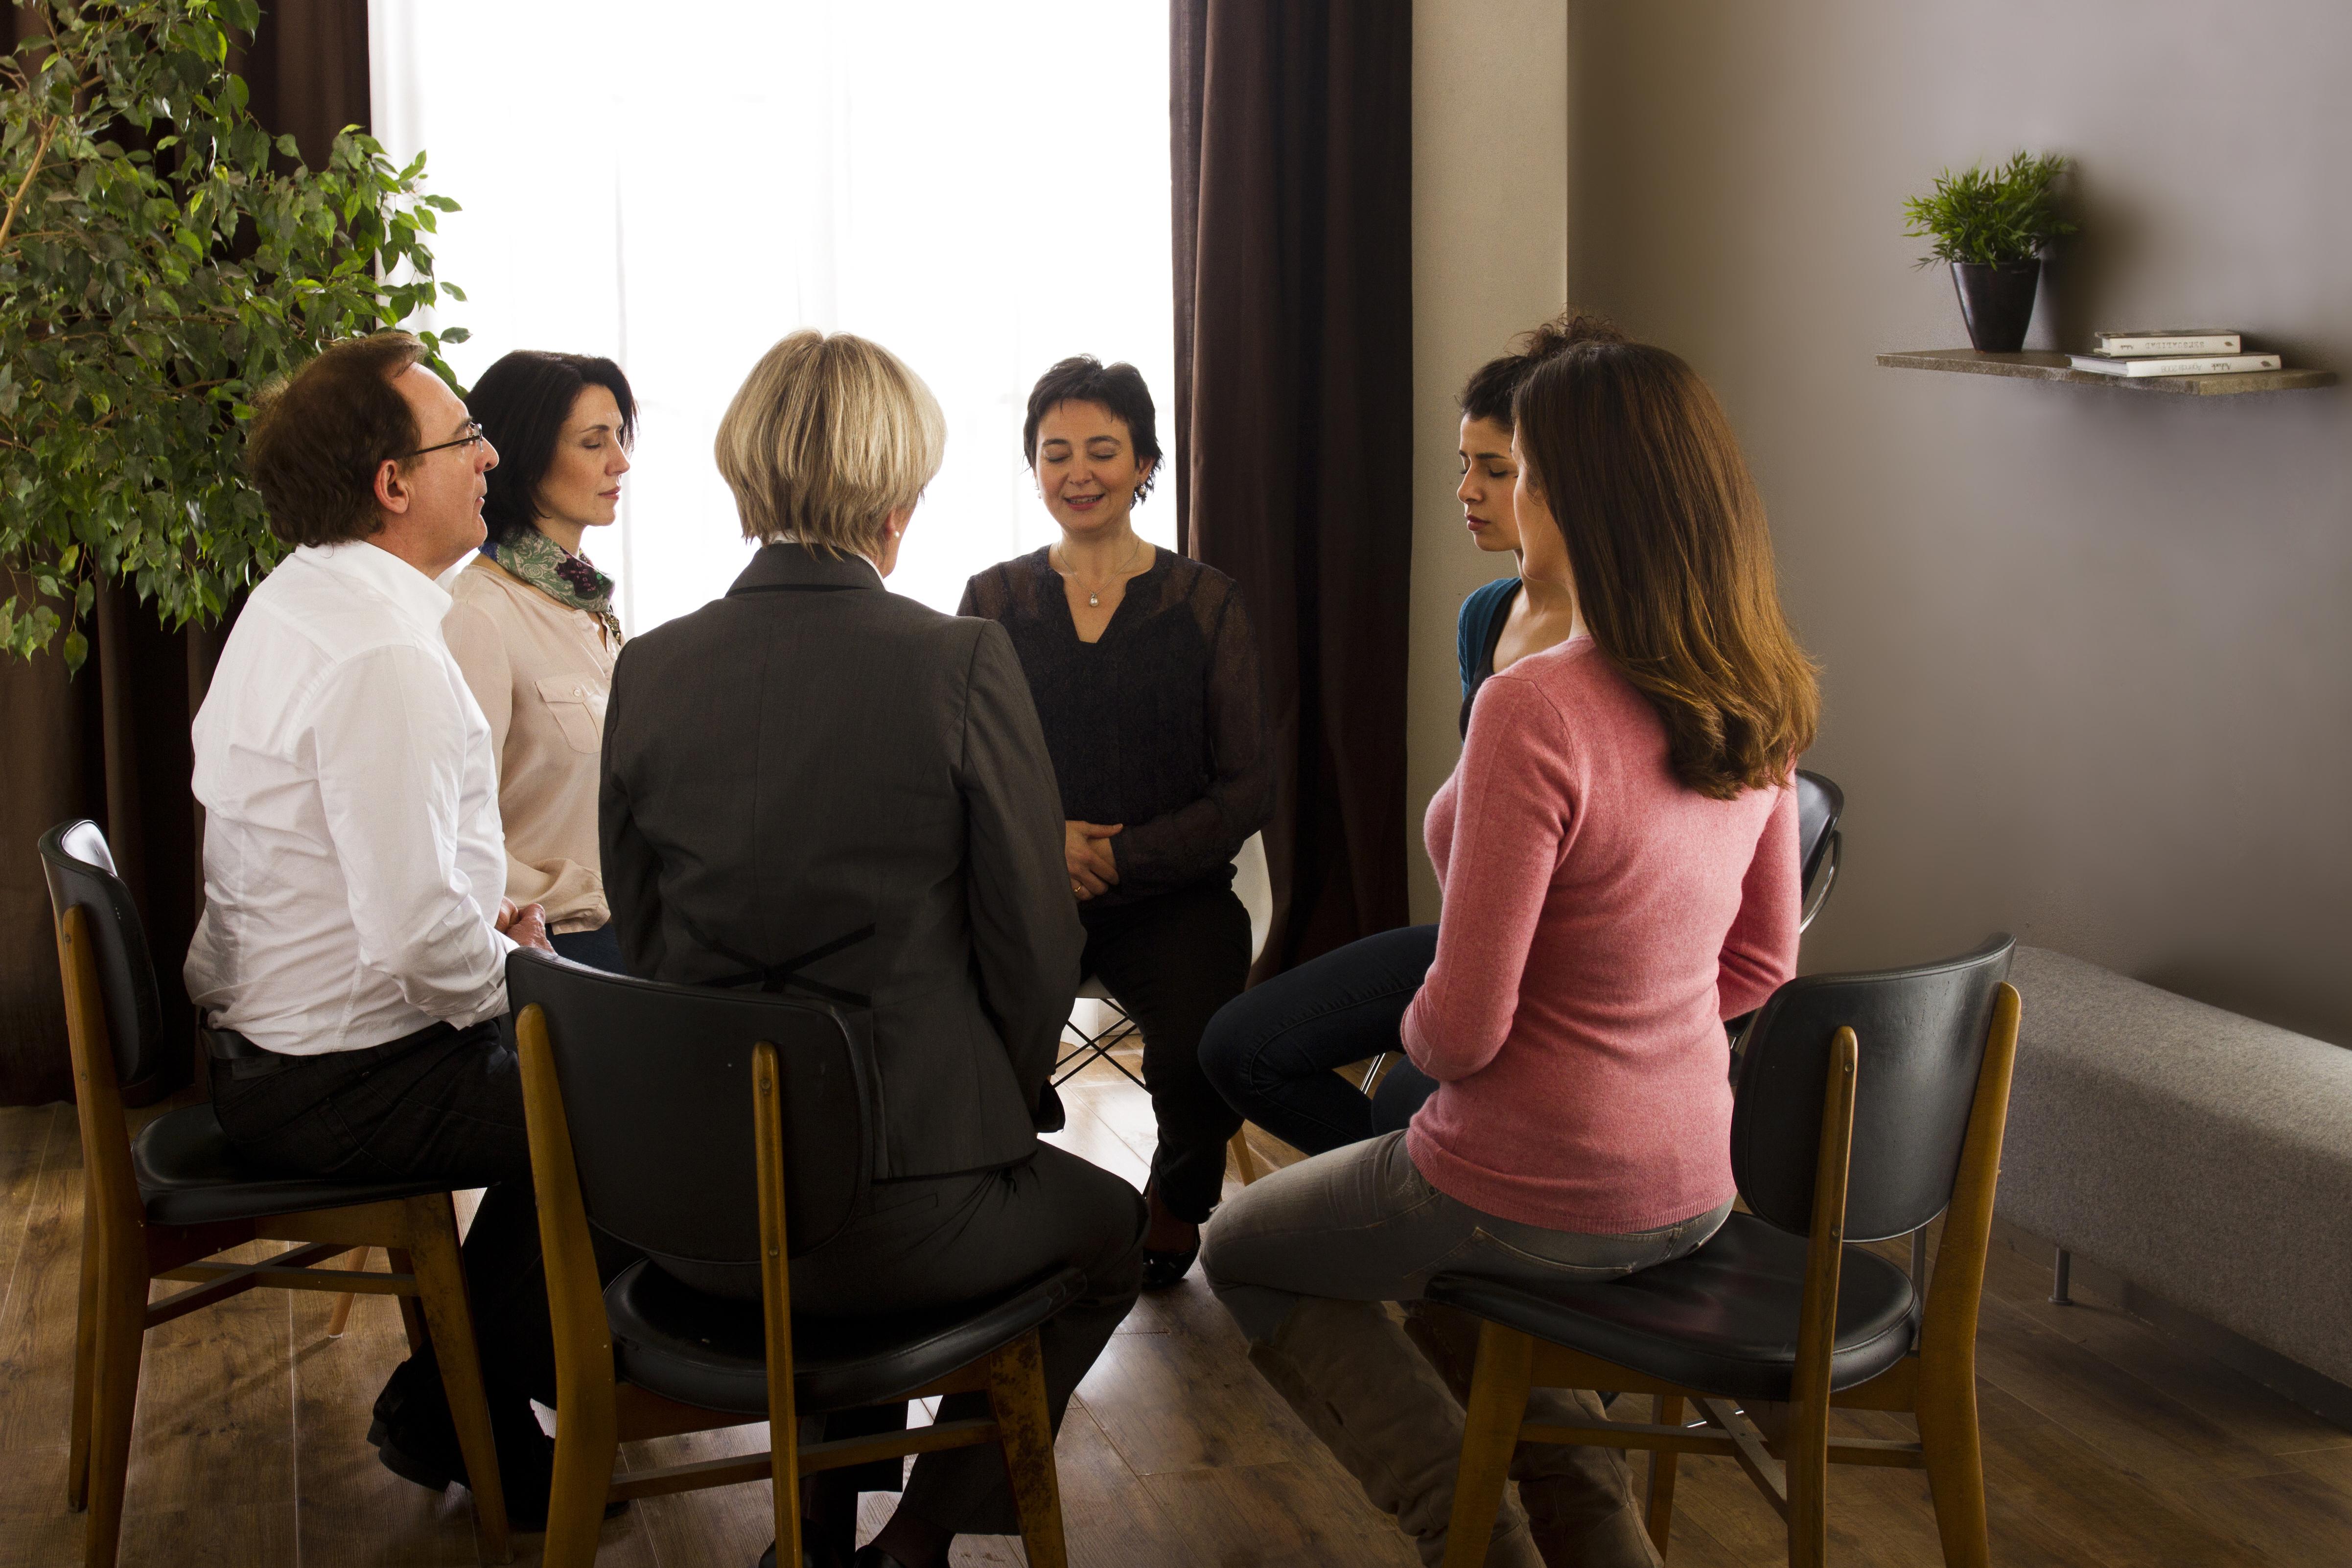 groupe pratiquant la sophrologie - Marie Duval sophrologue